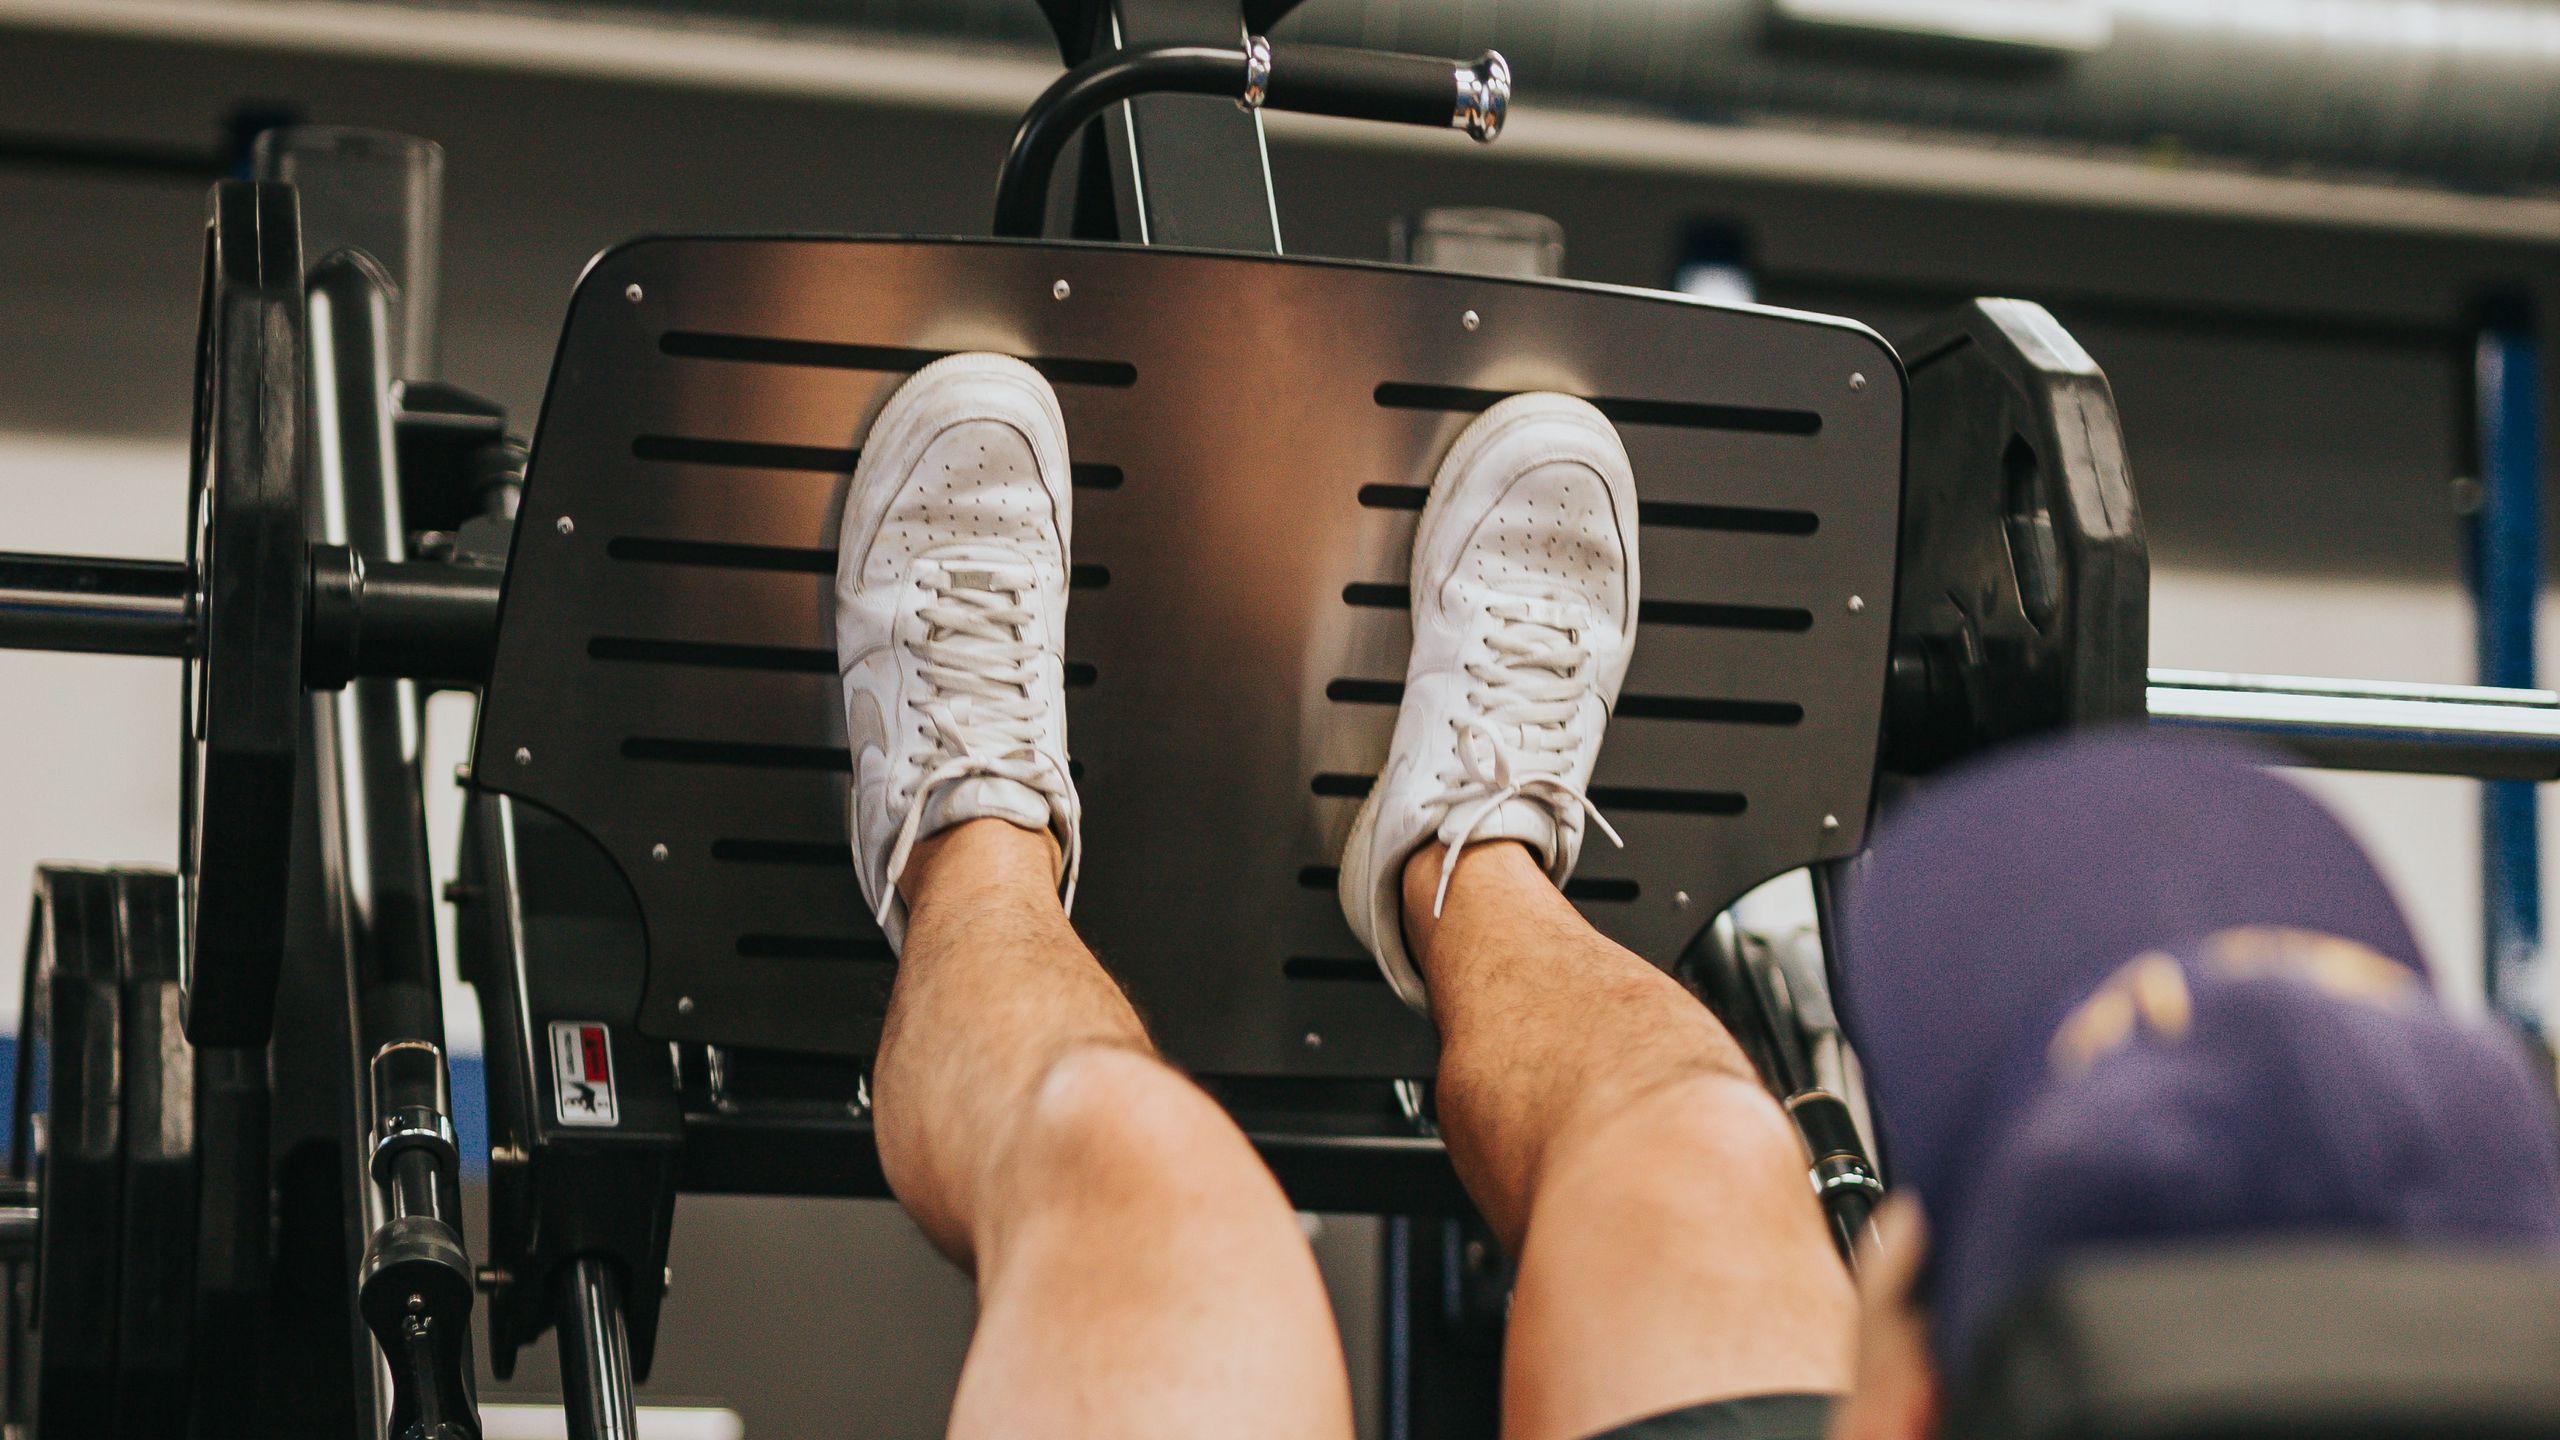 2560x1440 Wallpaper athlete foot, trainer, gym, sports